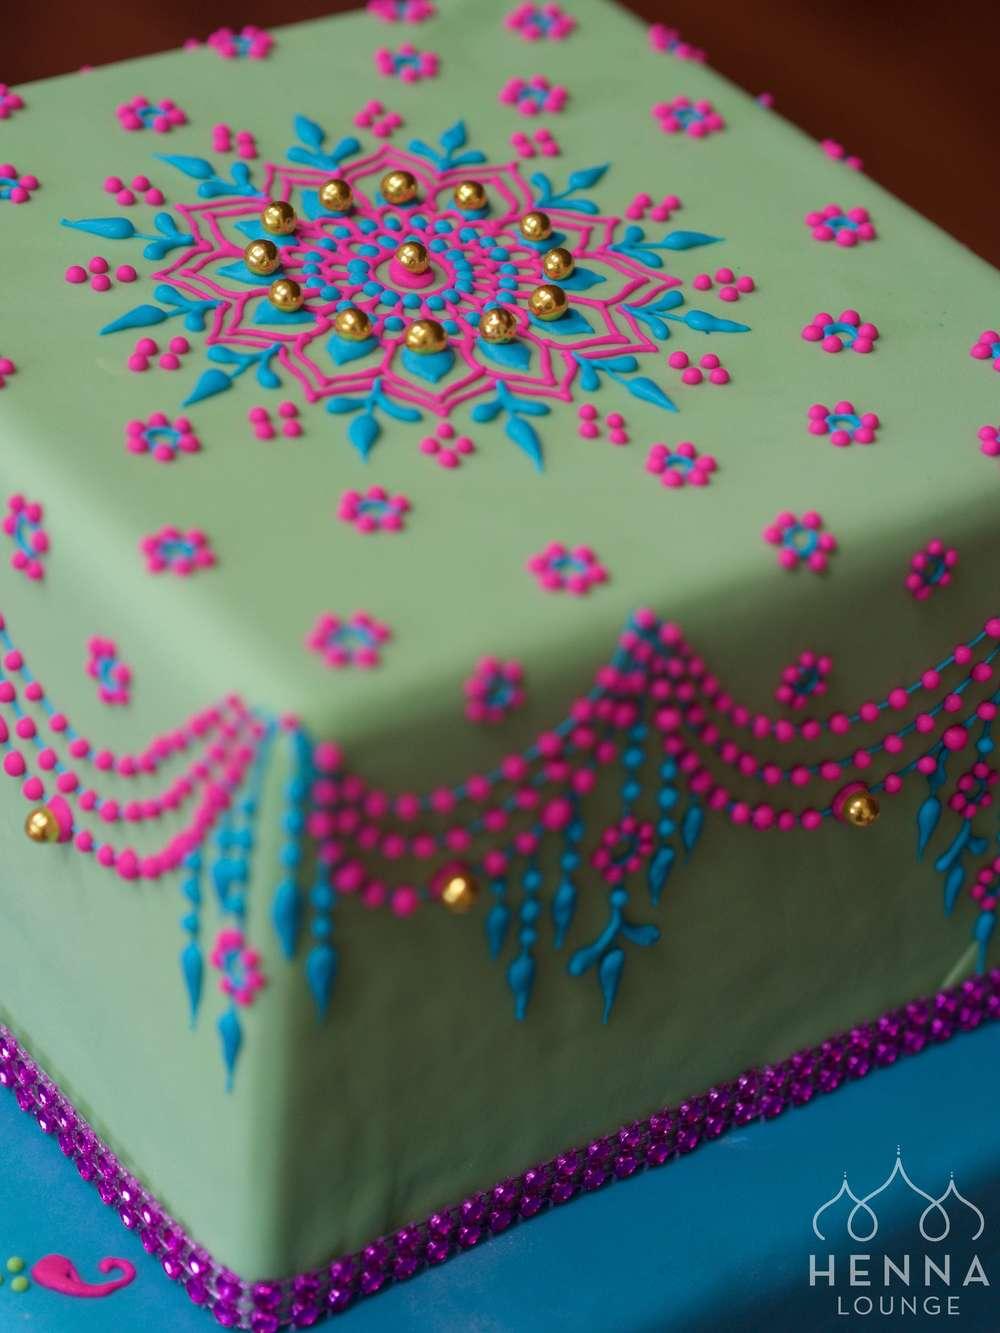 Mehndi Patterns For Cakes : Mehndi cakes by henna lounge —